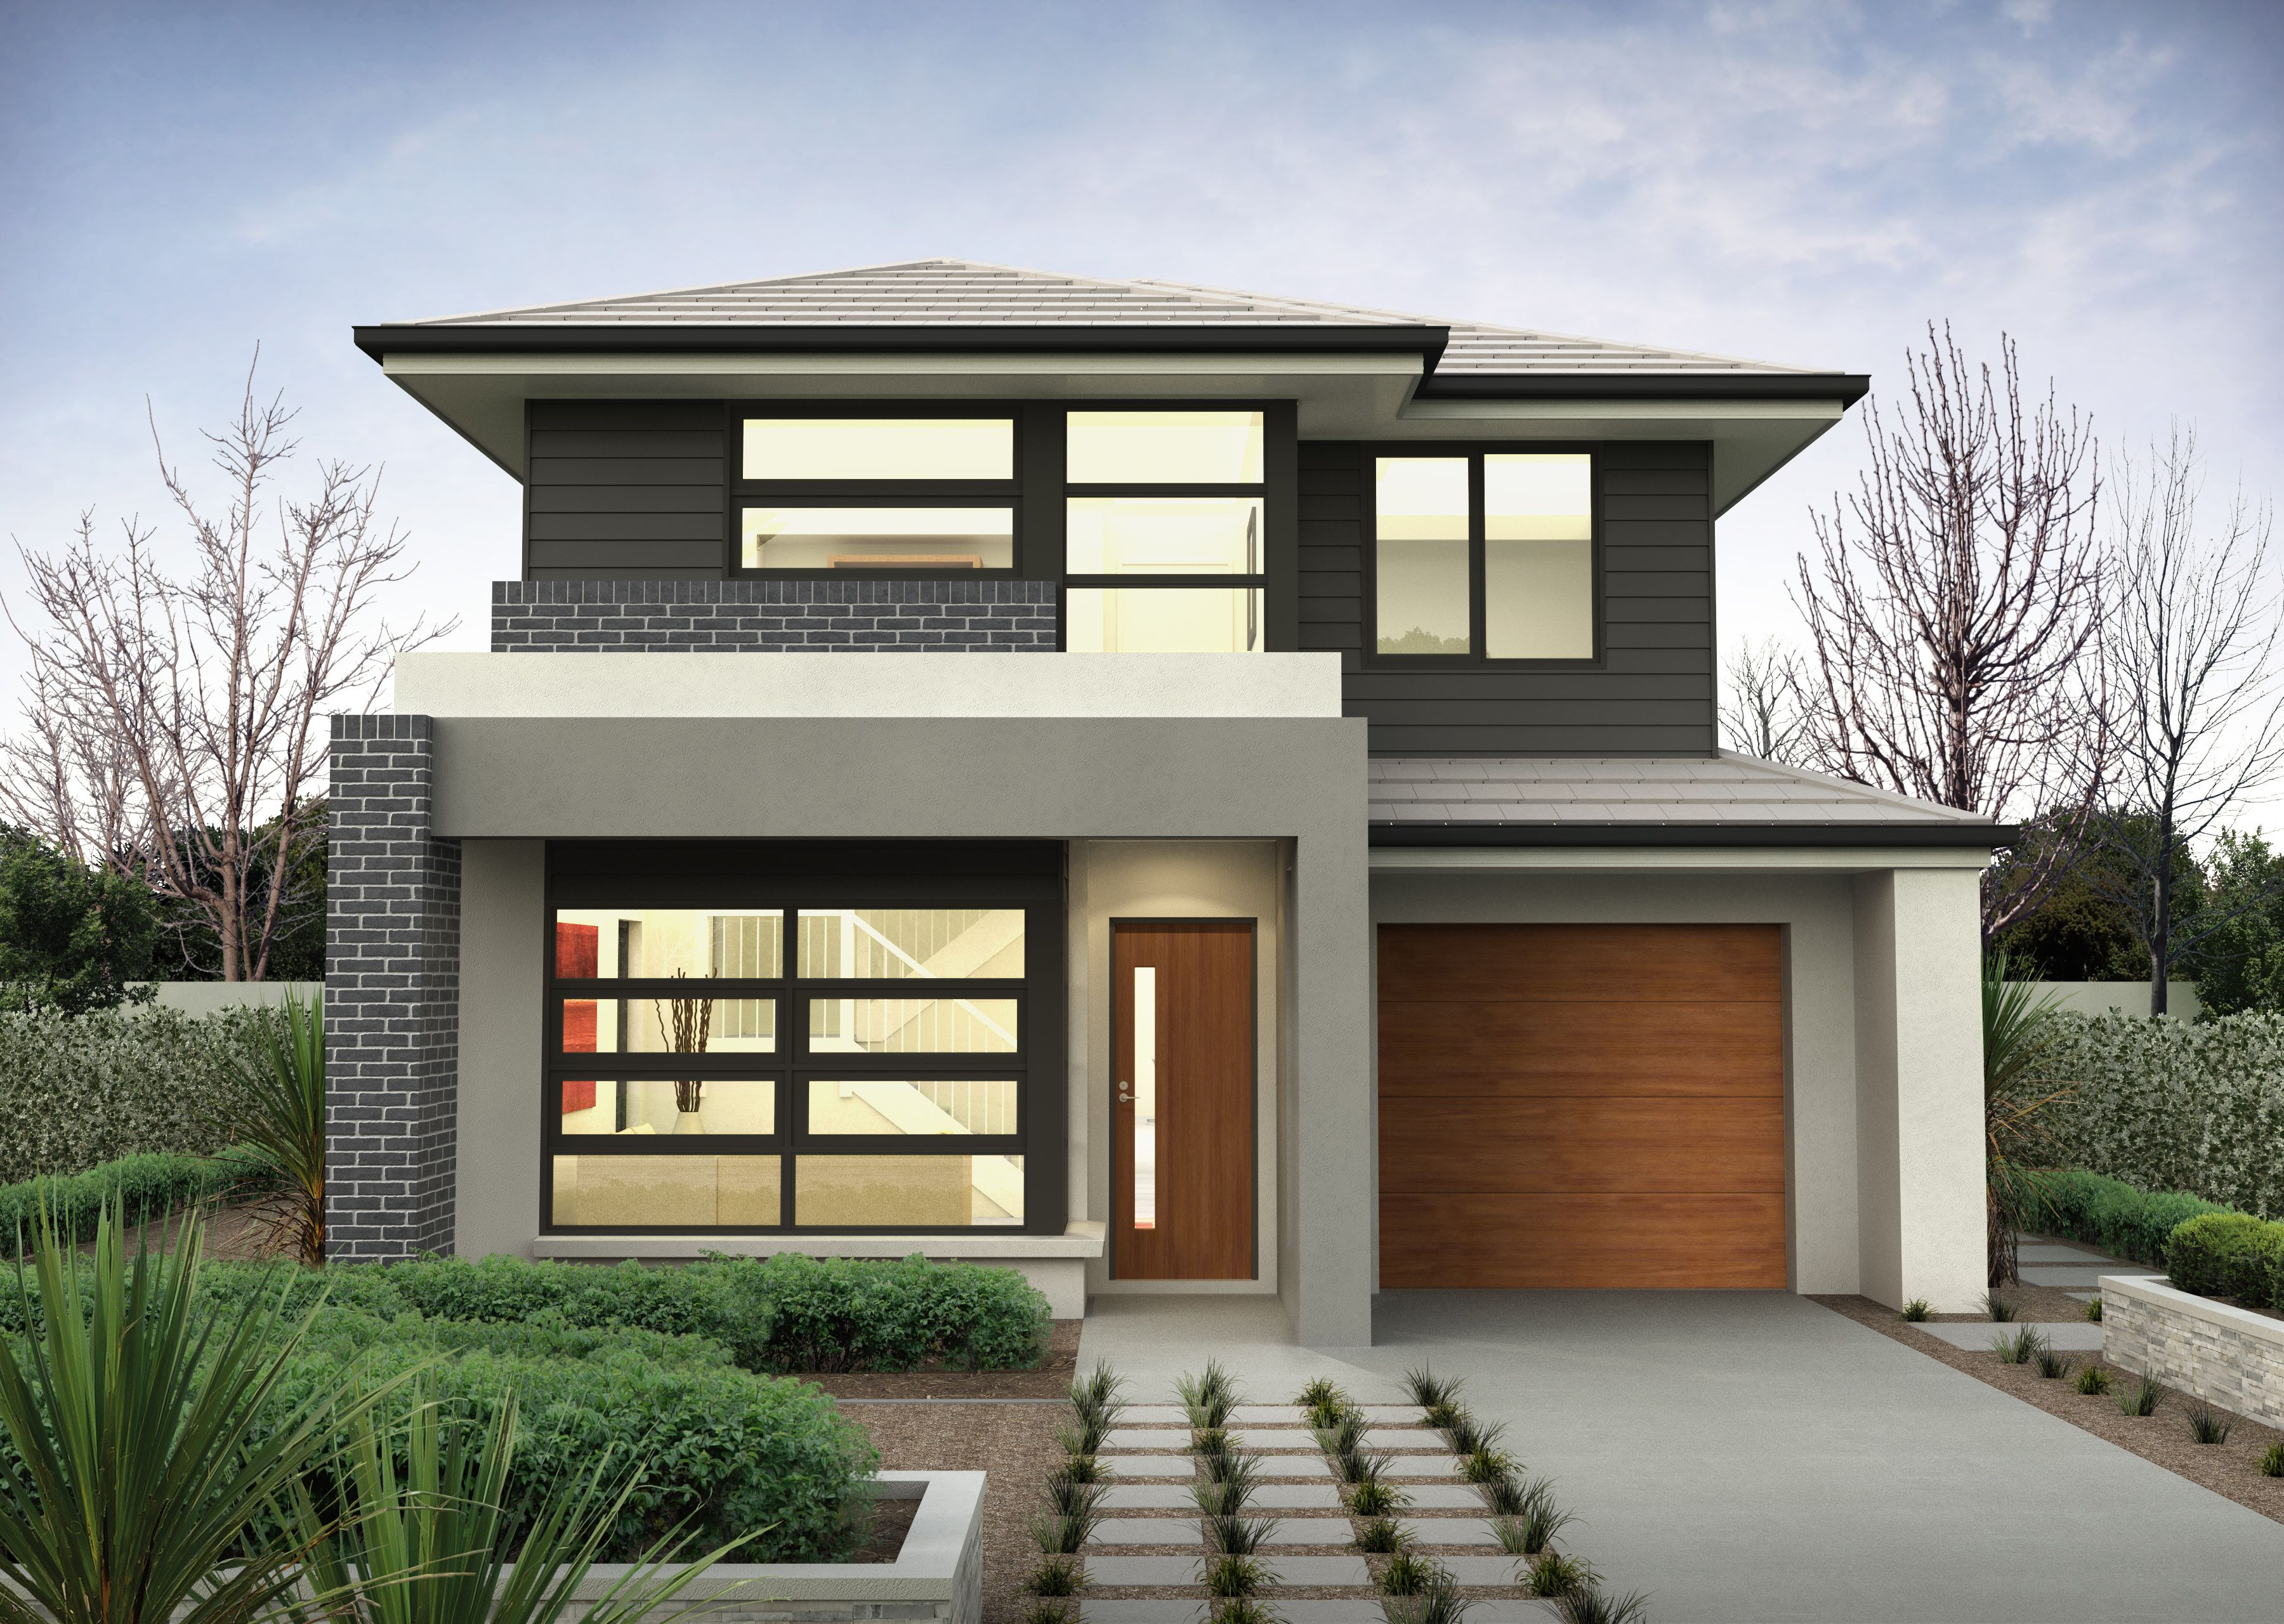 10m wide house plans Google Search Casas pintadas